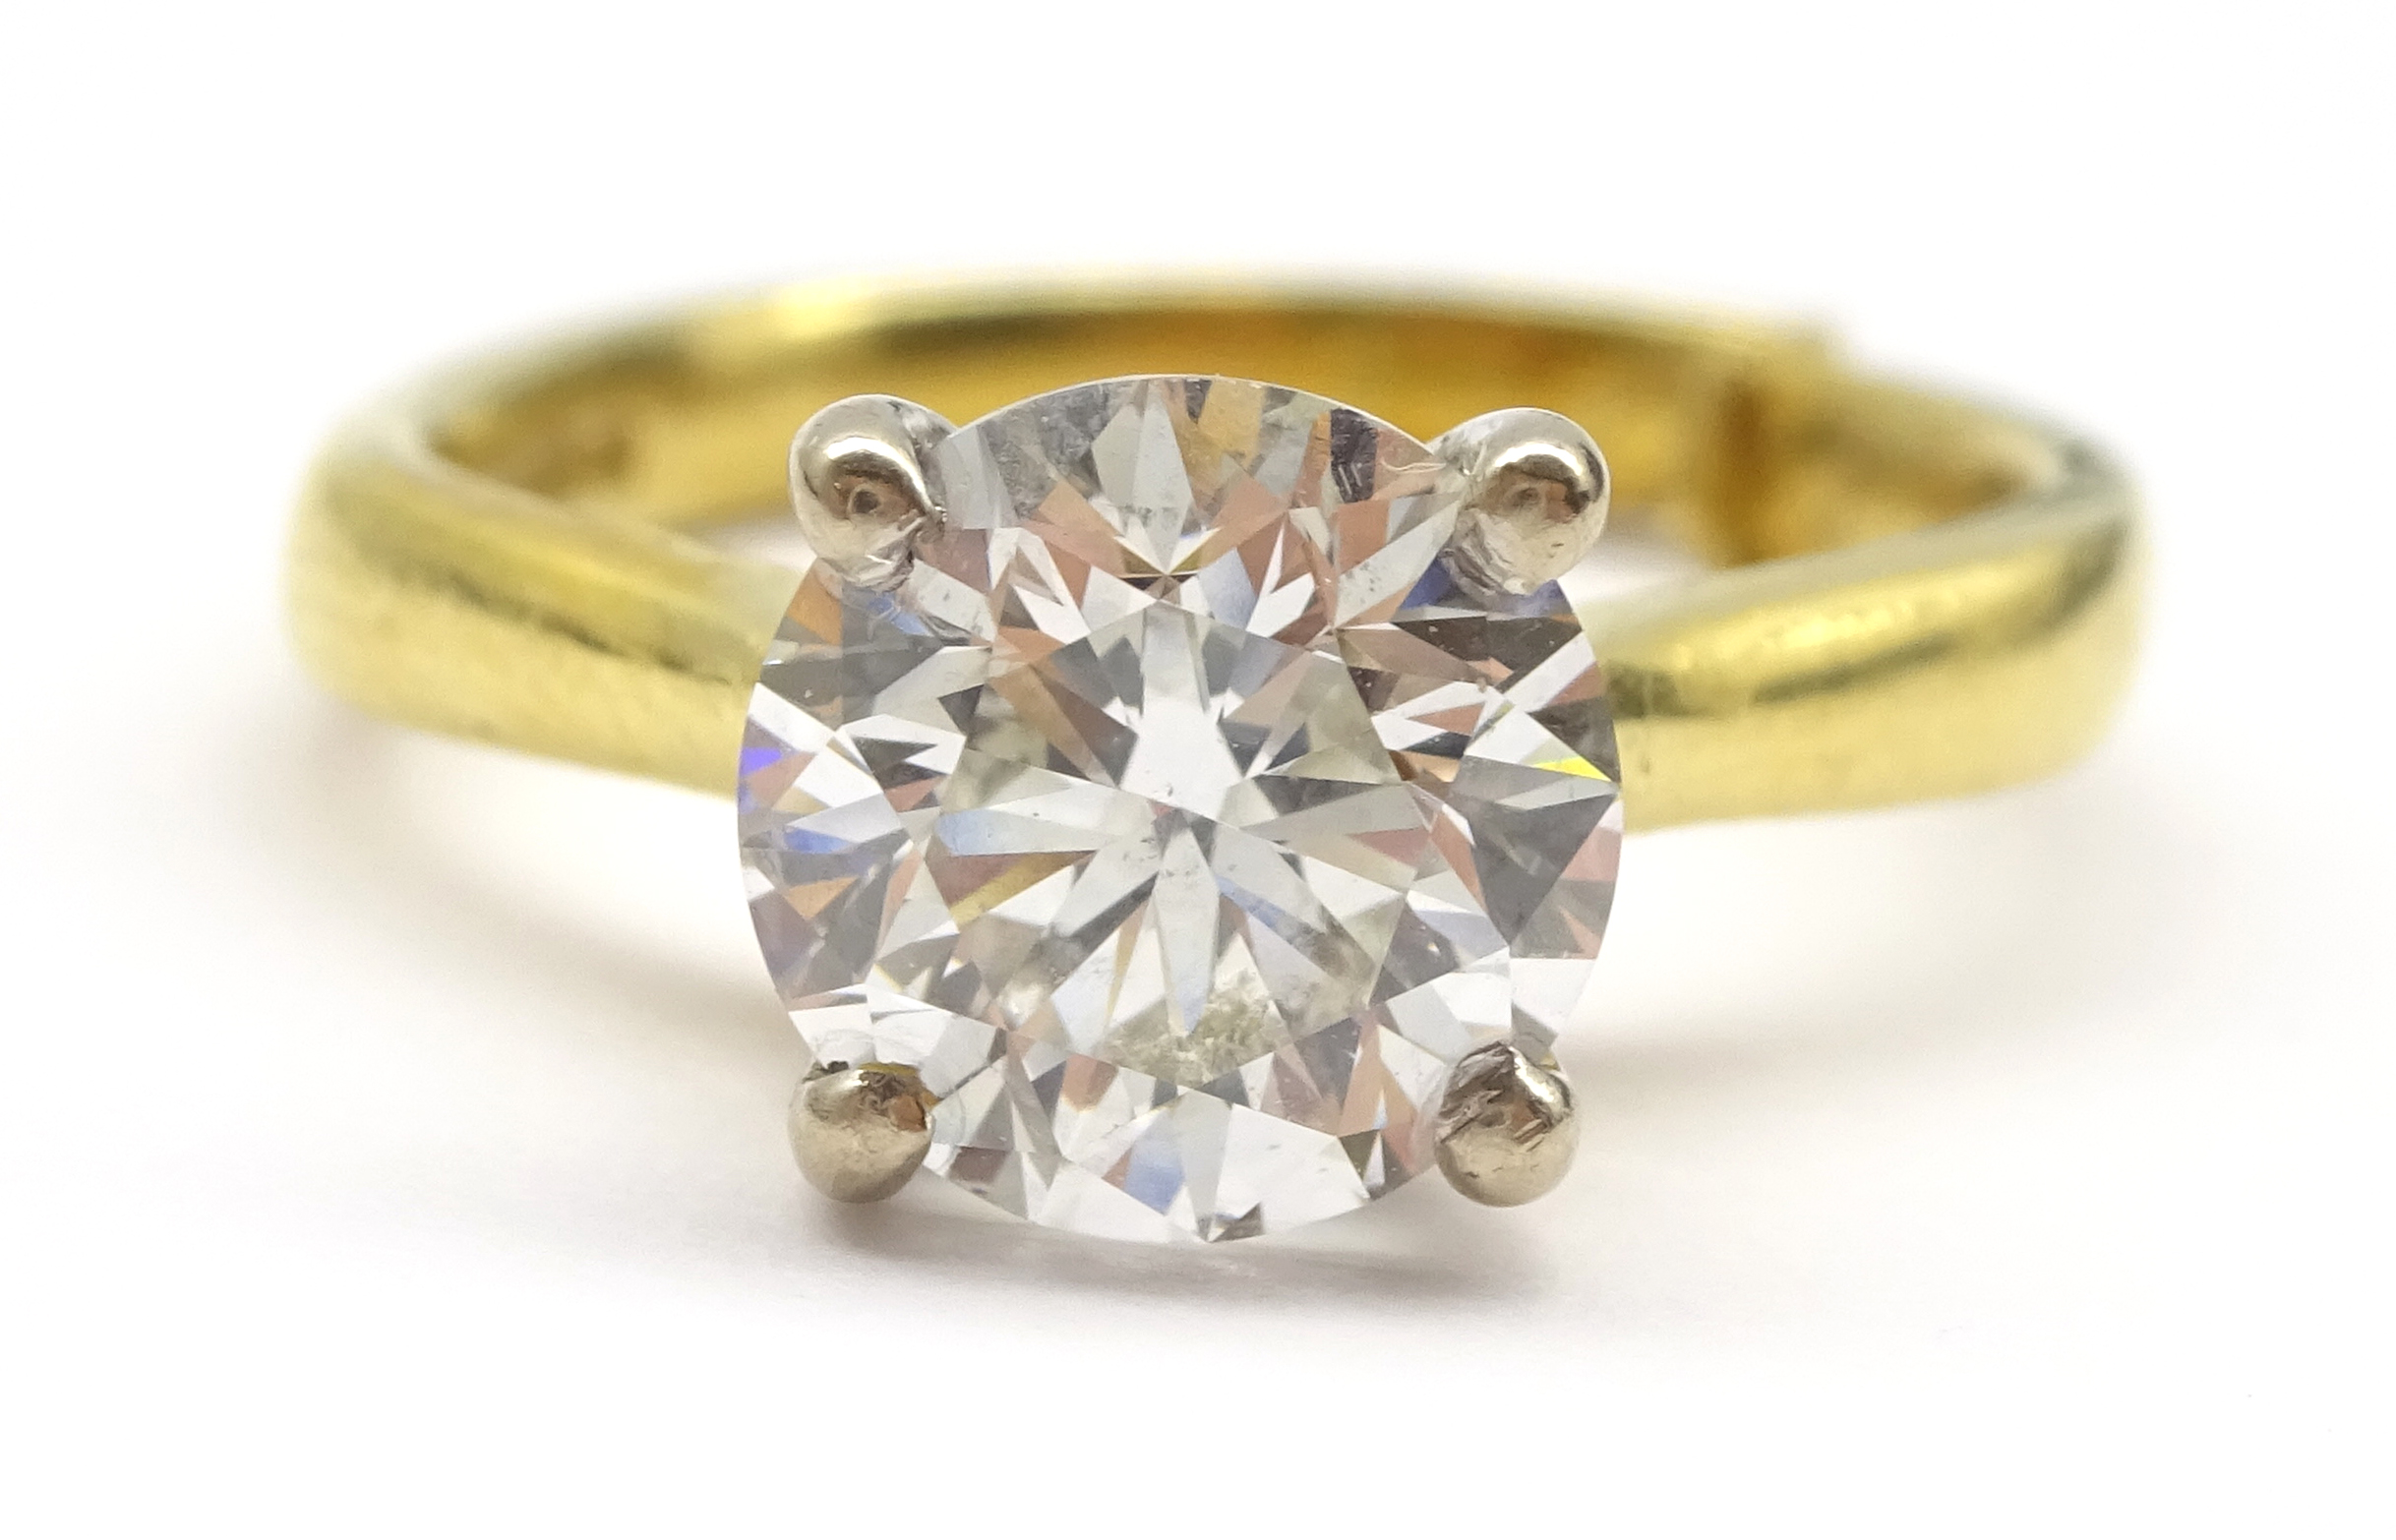 Lot 1007 - 18ct gold single stone diamond ring hallmarked, diamond approx 1.